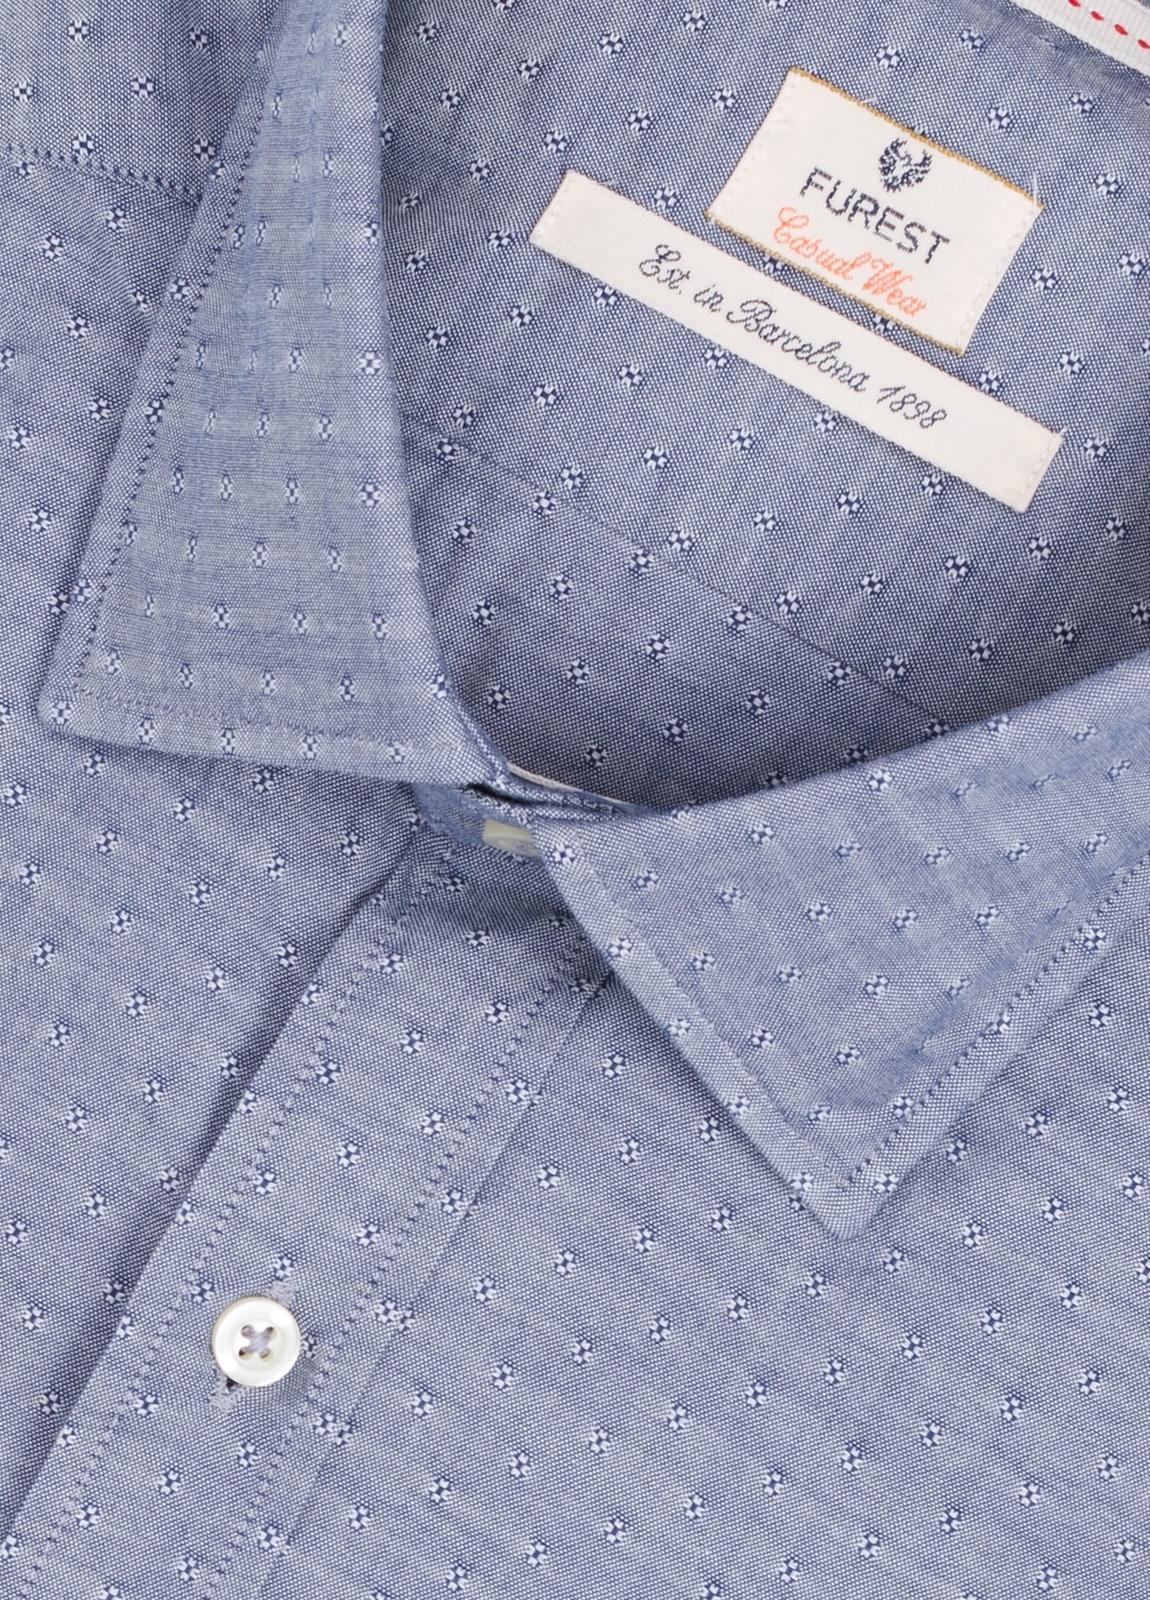 Camisa Casual Wear SLIM FIT Modelo PORTO microdibujo color azul. 100% Algodón. - Ítem1